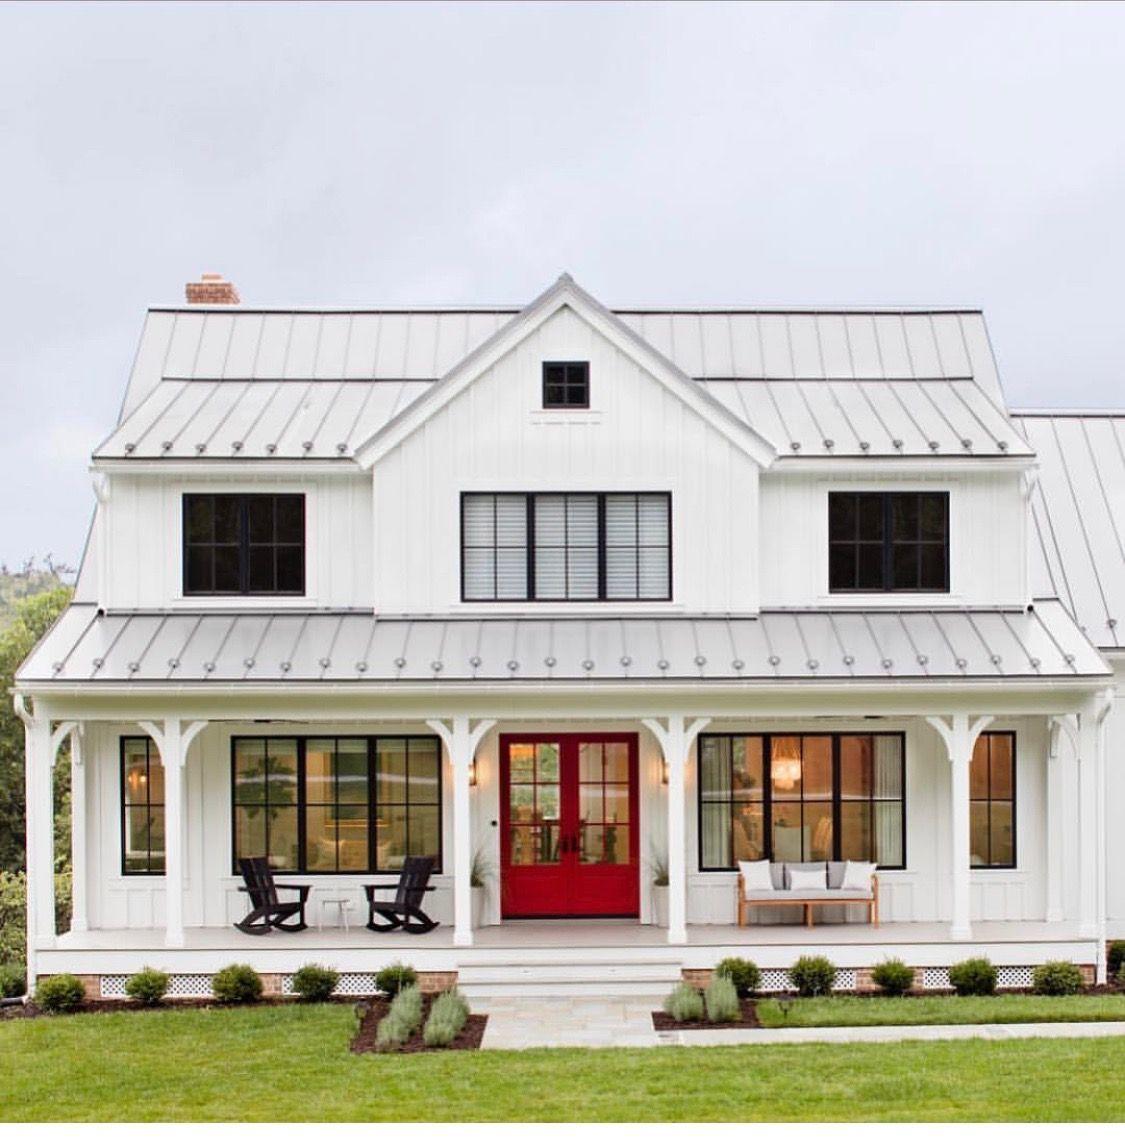 White exterior, light grey metal roof, bright red door